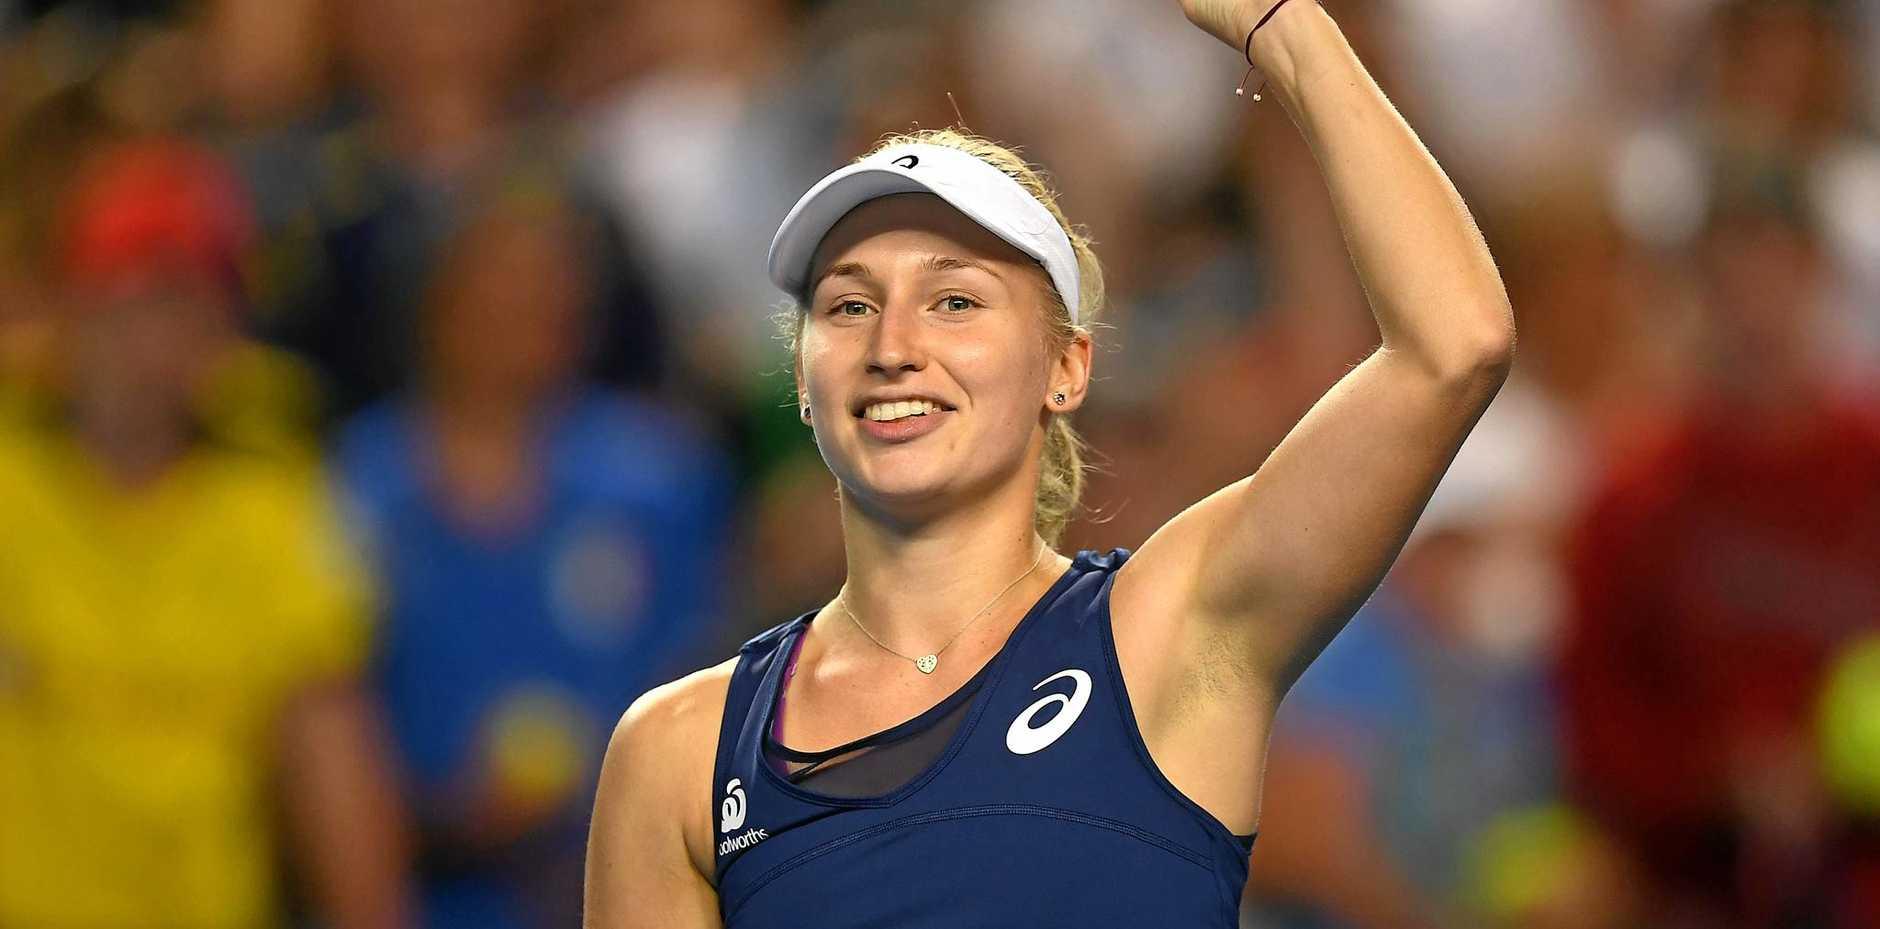 Daria Gavrilova celebrates her win against Ana Konjuh of Croatia